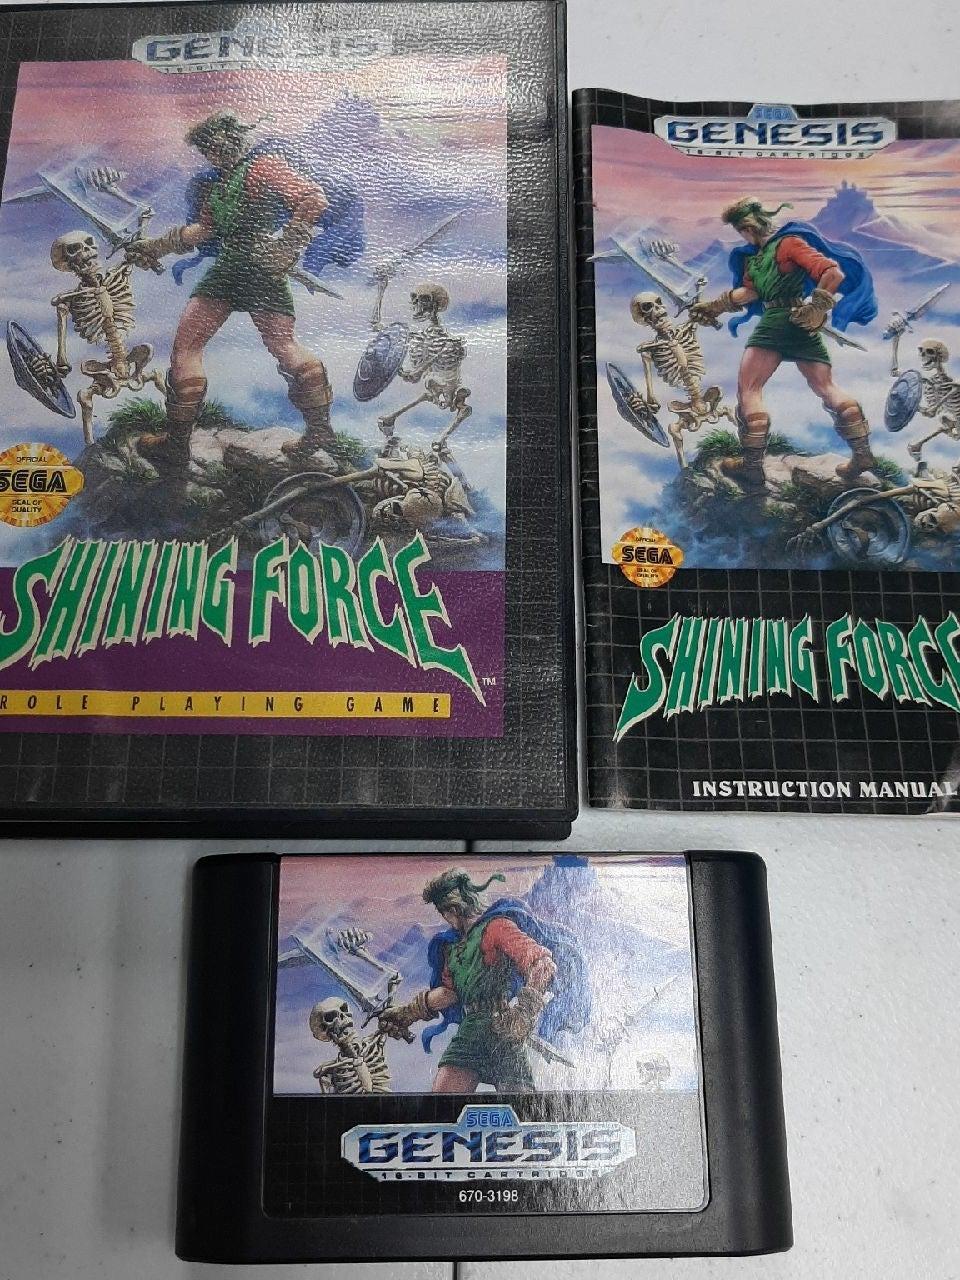 Shining Force (Sega Genesis)